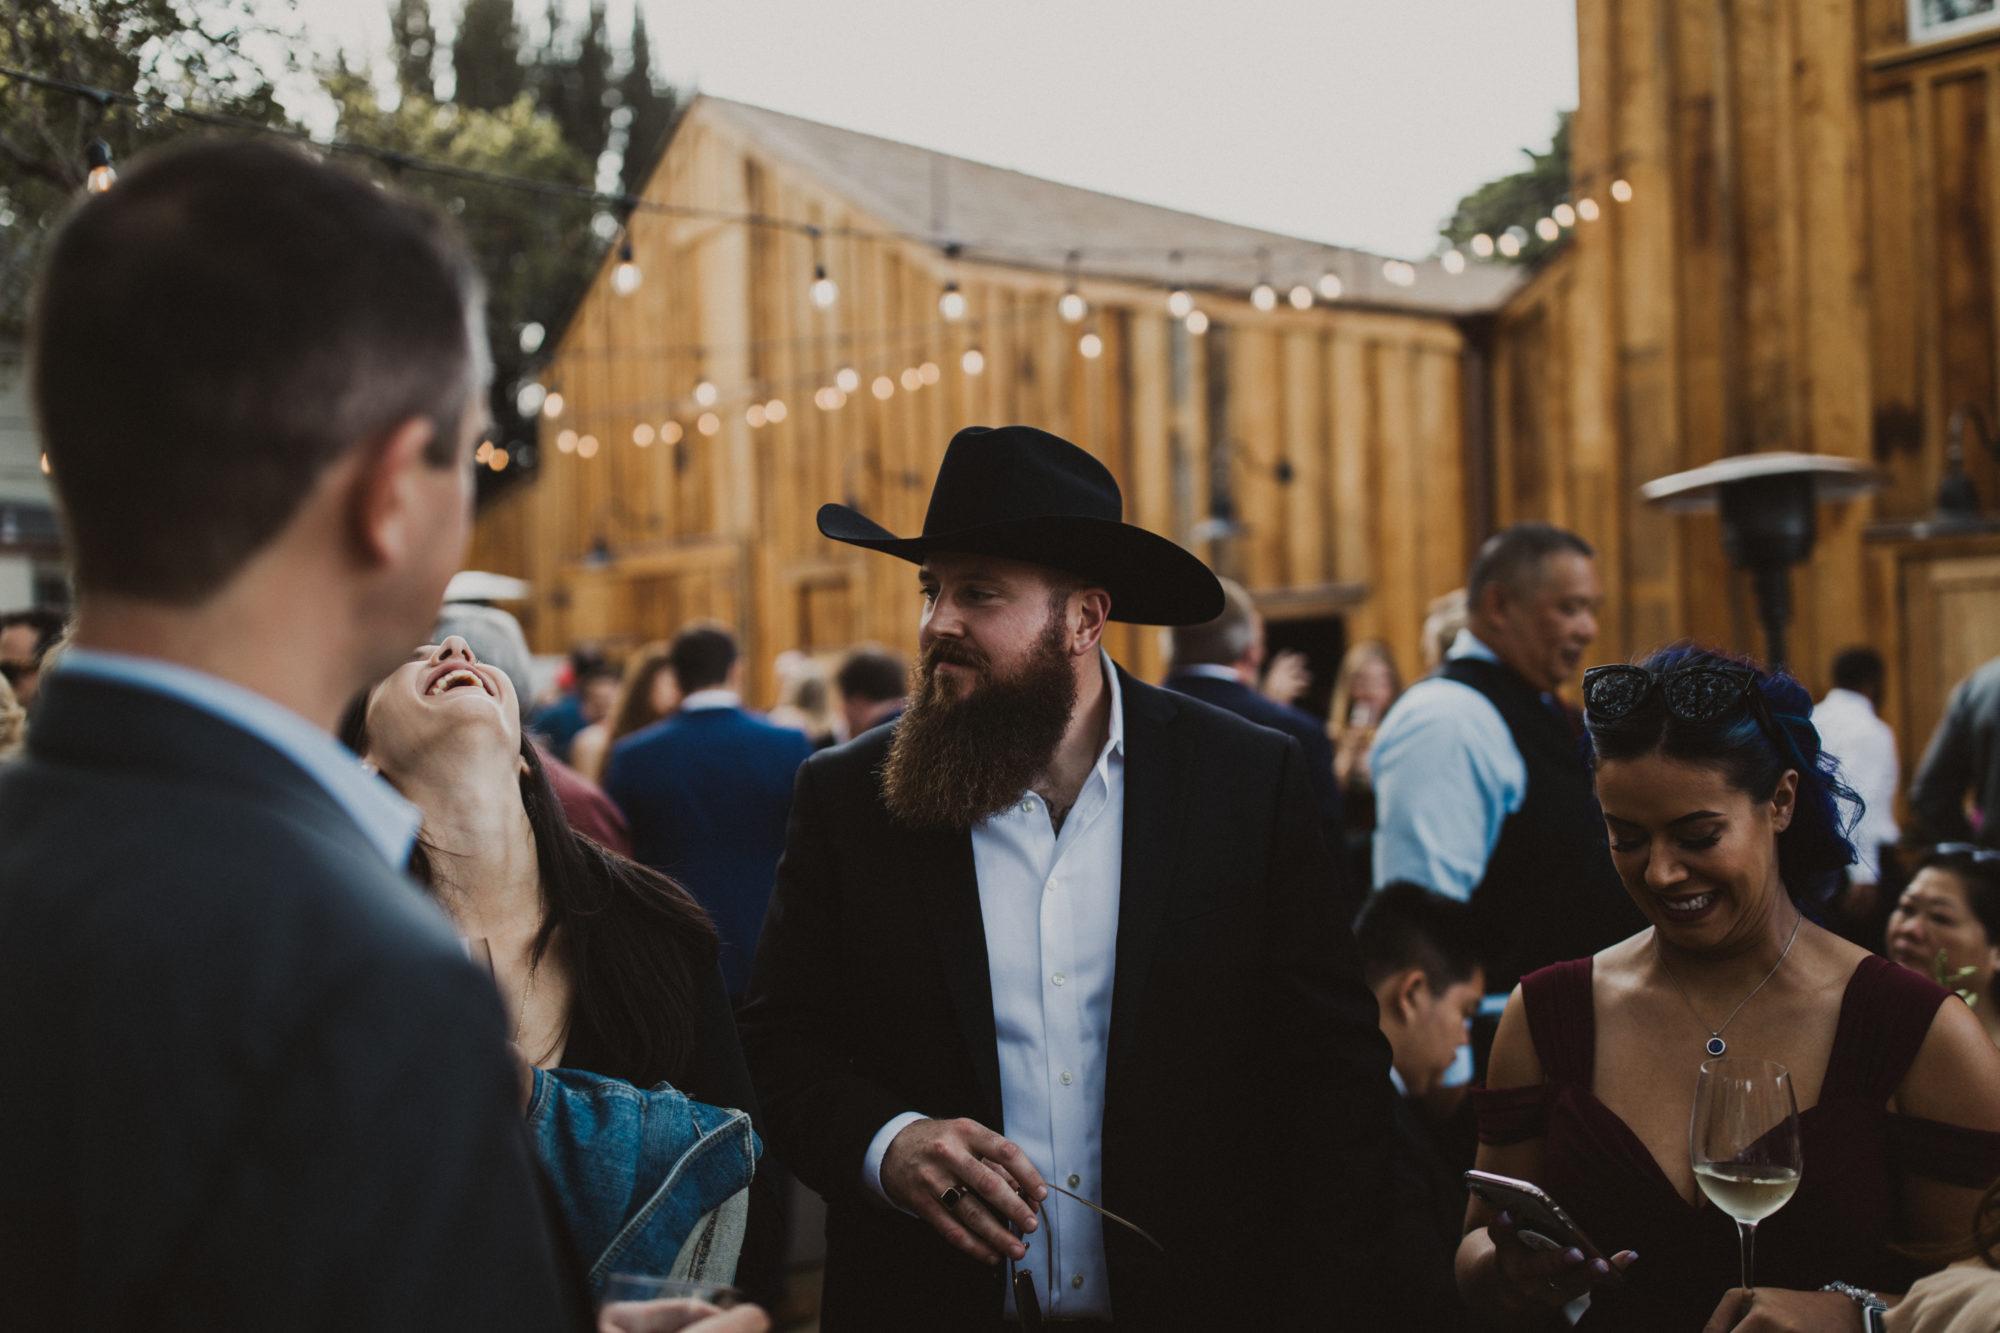 Cooper Molera Barns Guests at Cocktail Hour